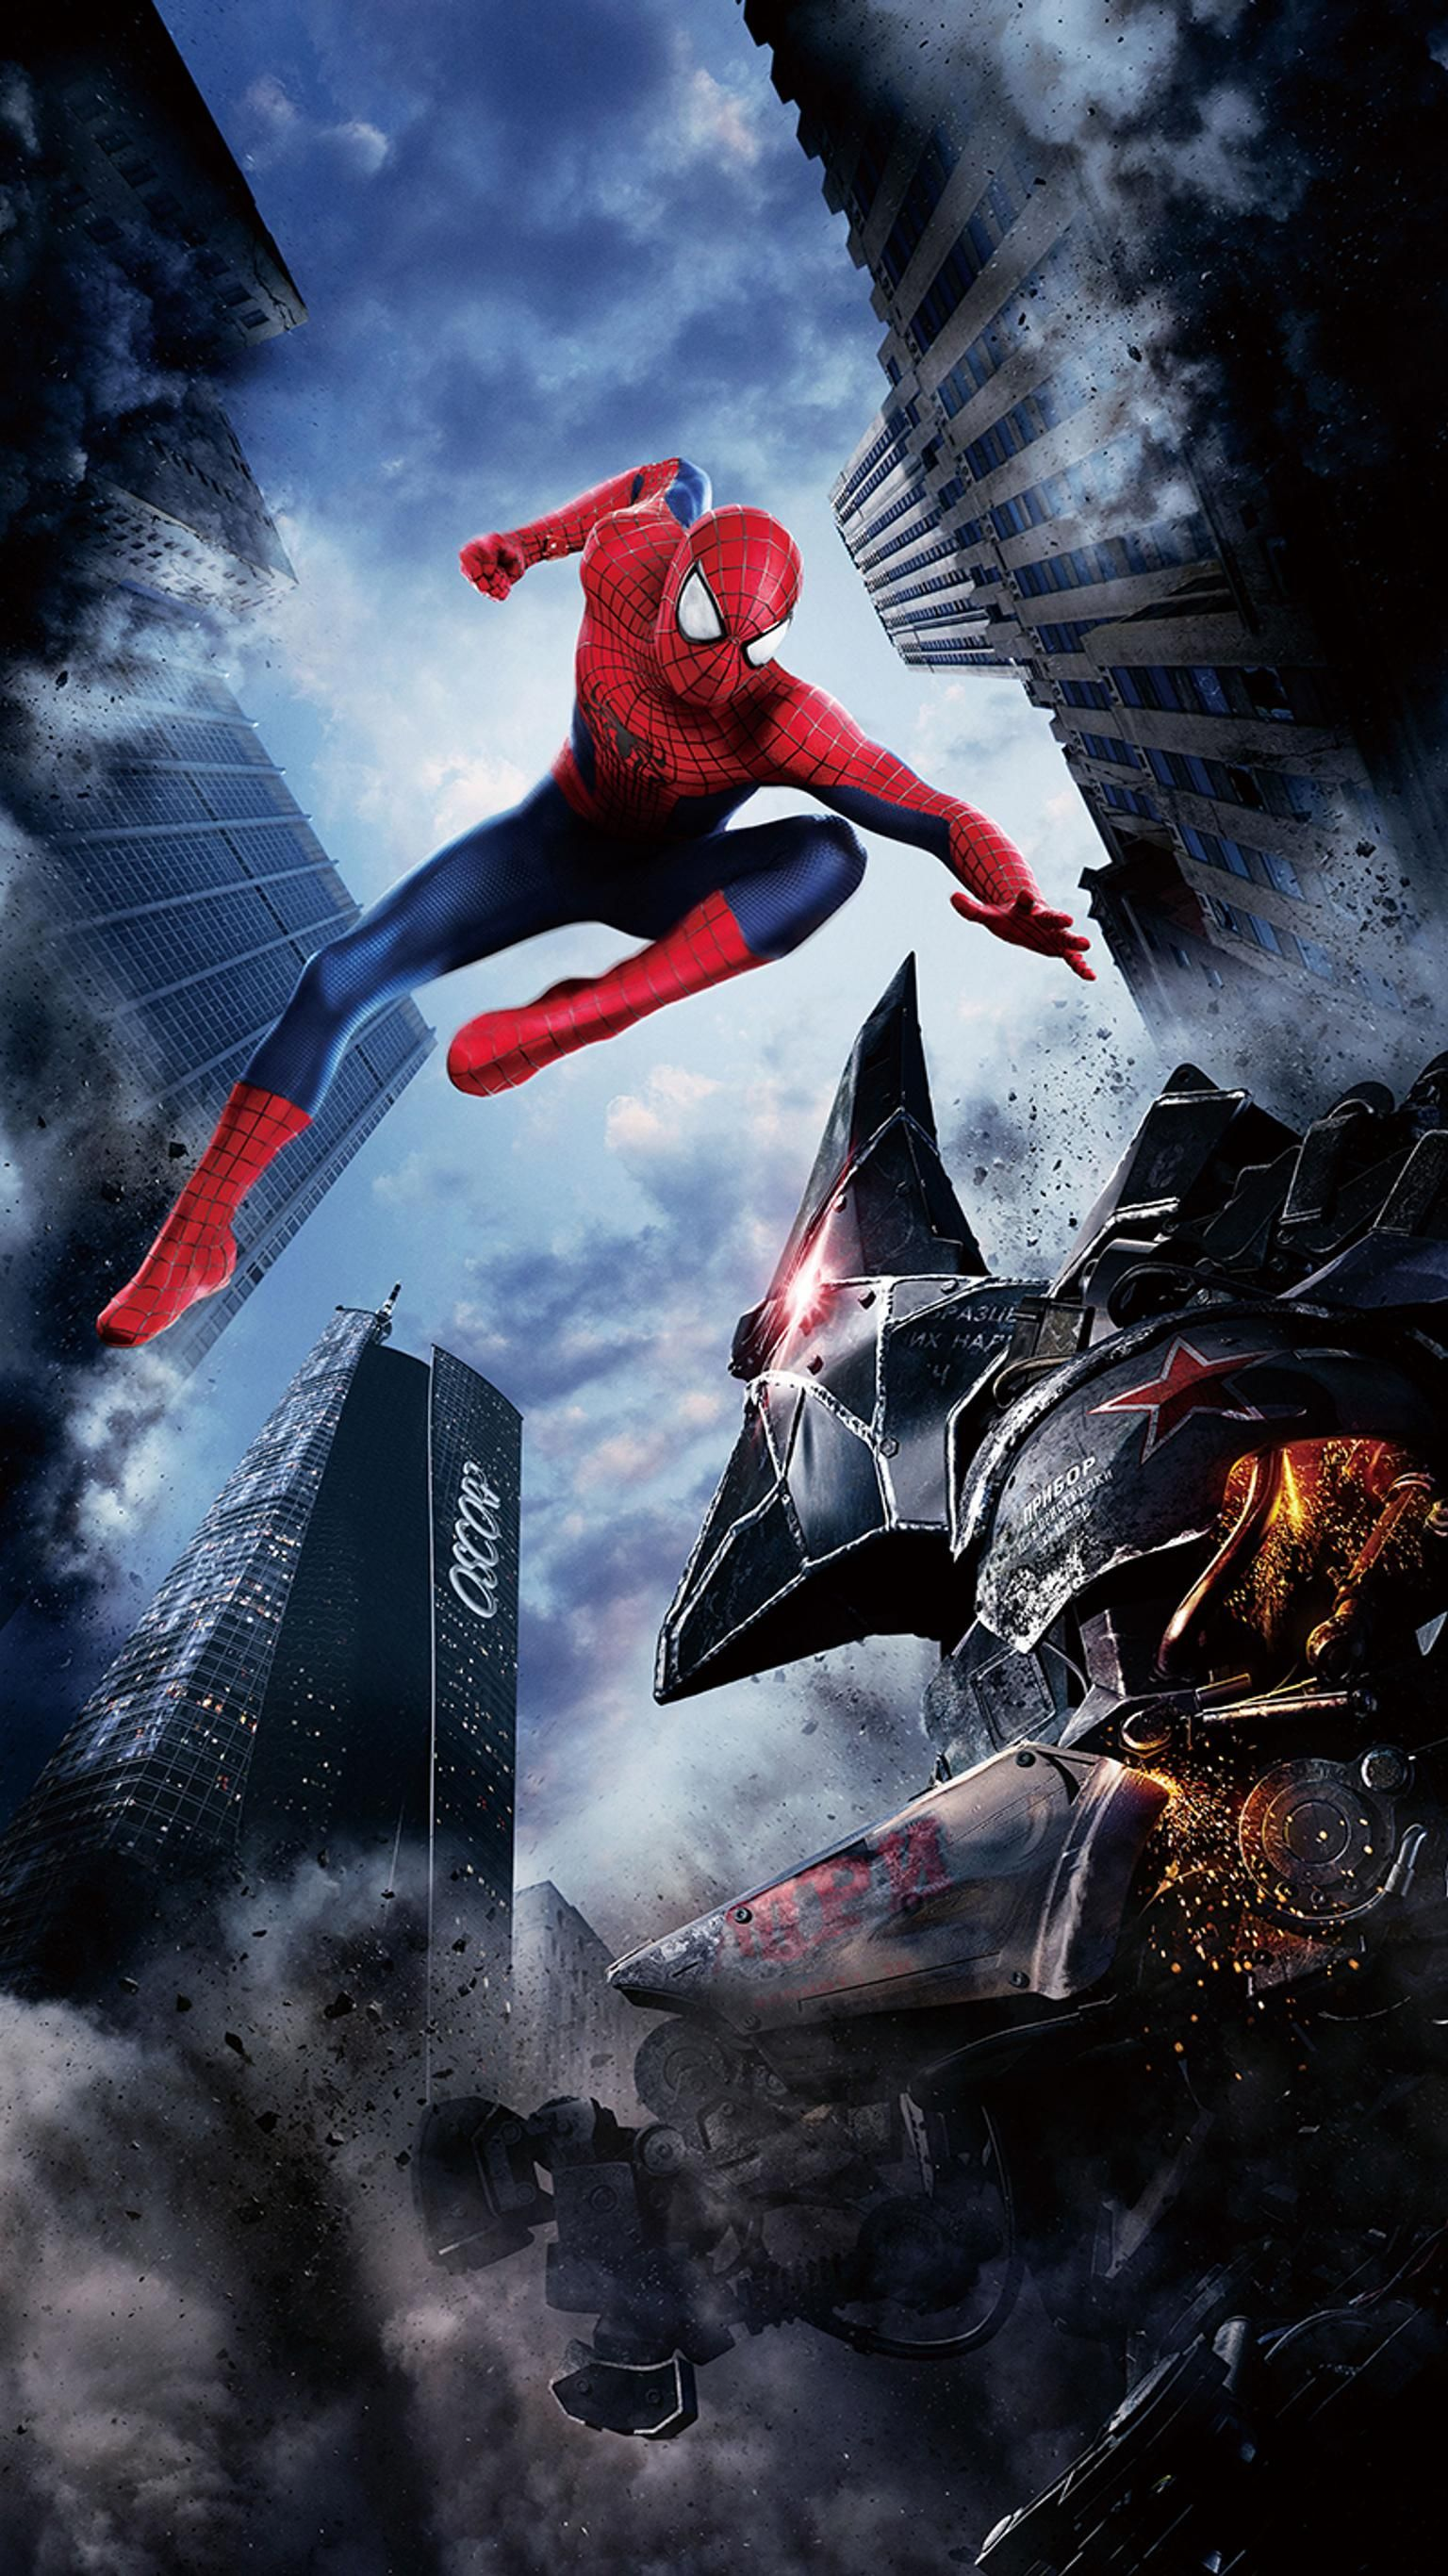 The Amazing Spider Man 2 2014 Phone Wallpaper Moviemania Spider Man 2 Amazing Spiderman Spiderman